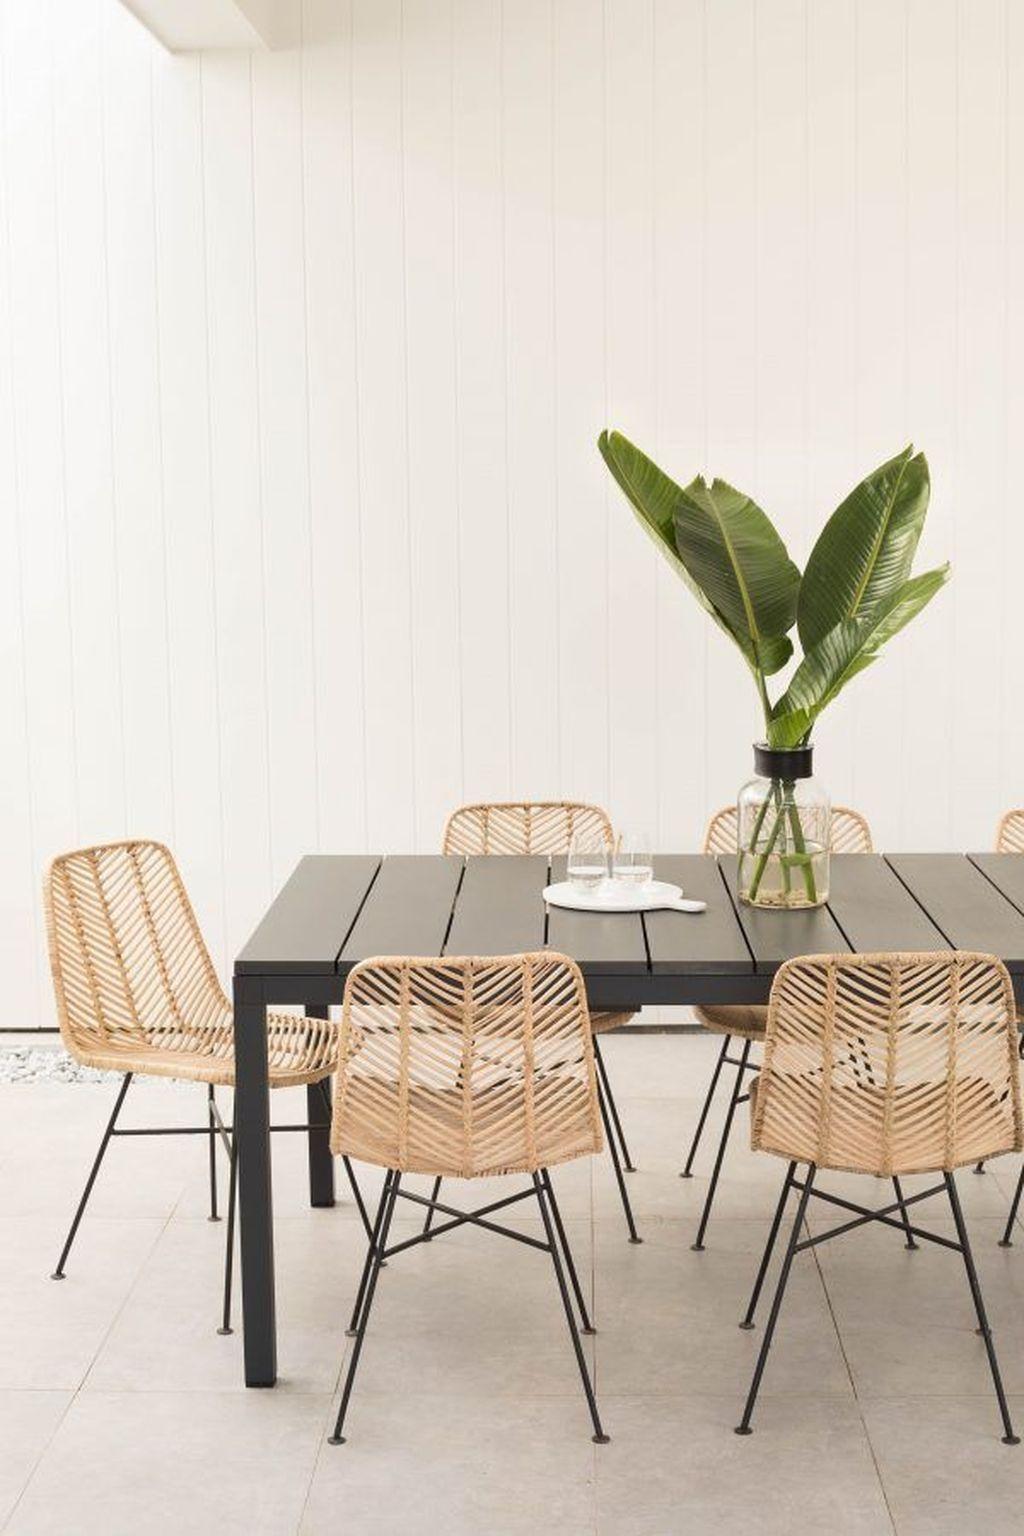 39 Gorgeous Rattan Furniture Design Ideas | Rattan dining